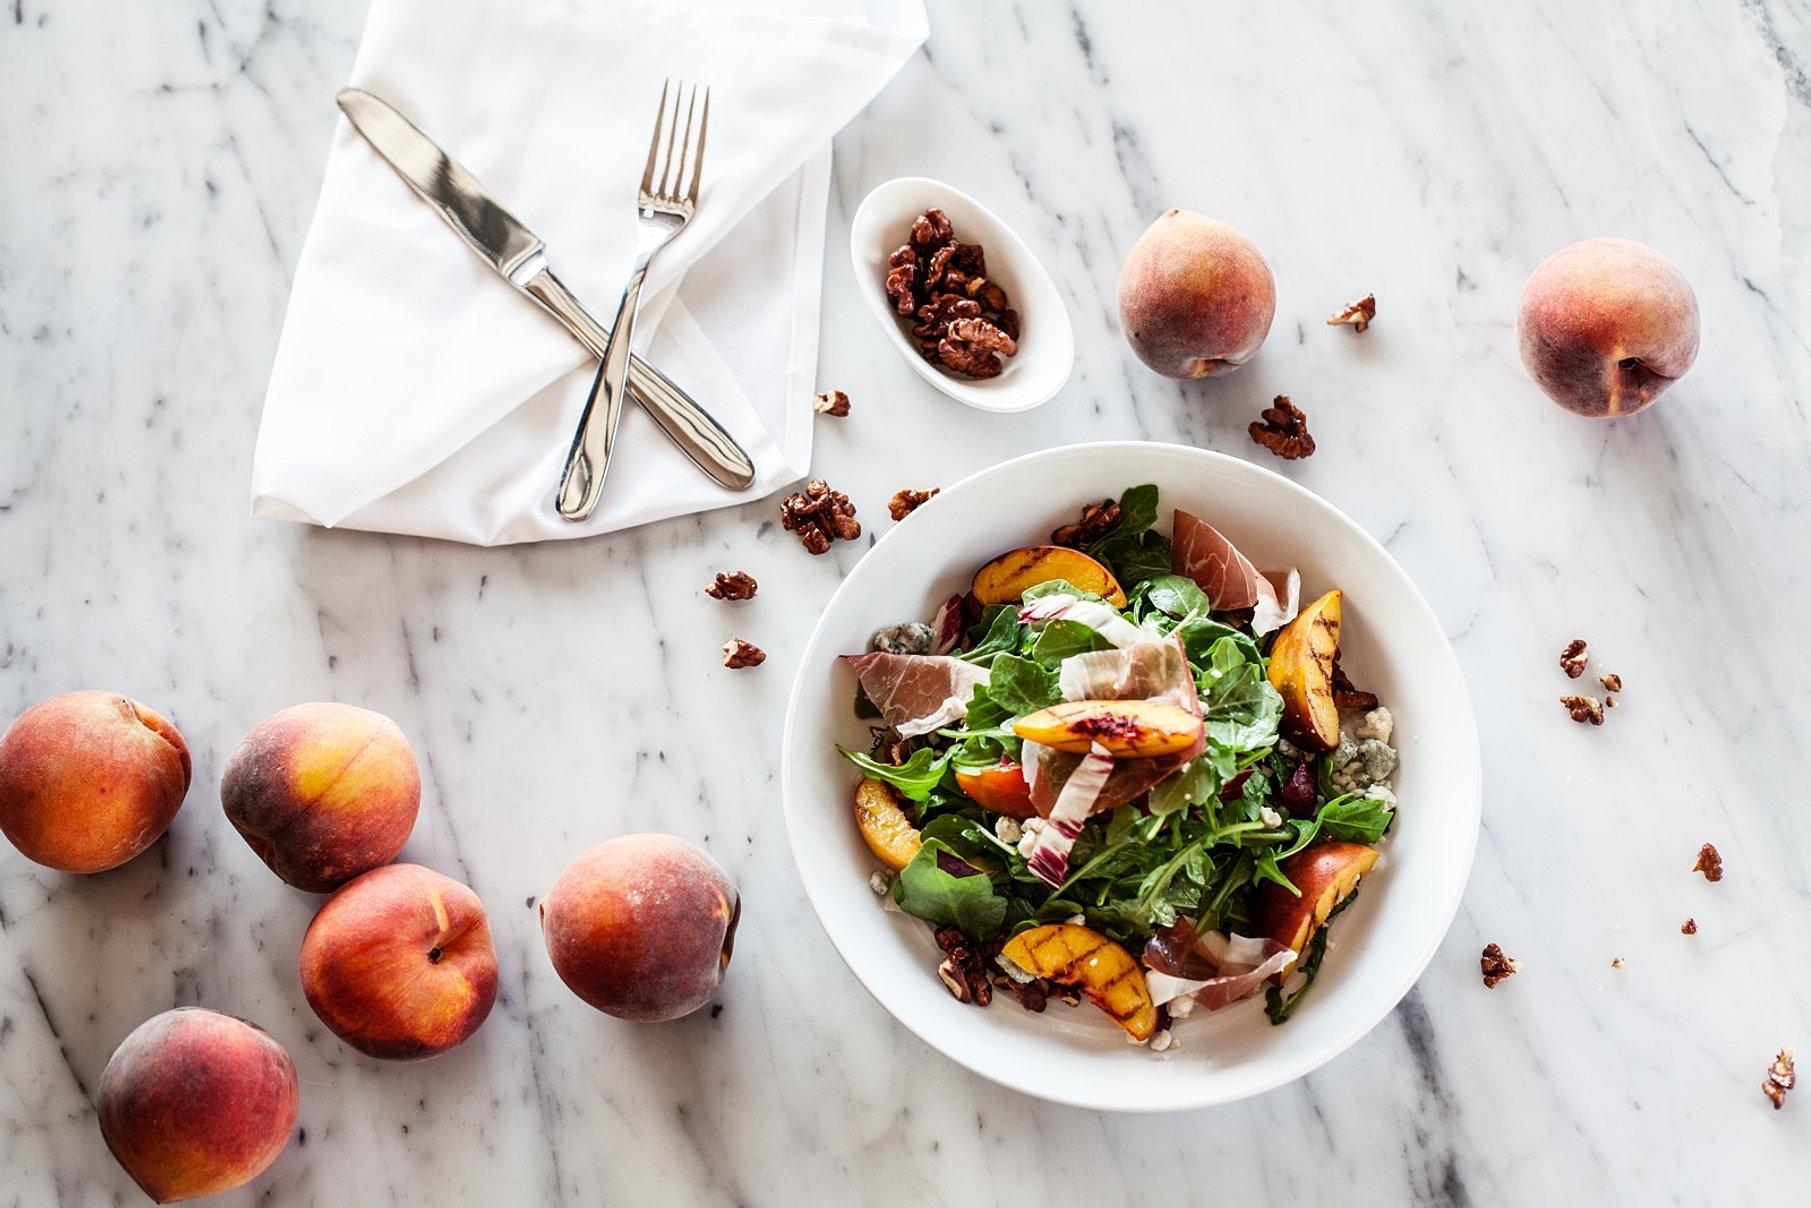 White apron dc nutrition - About